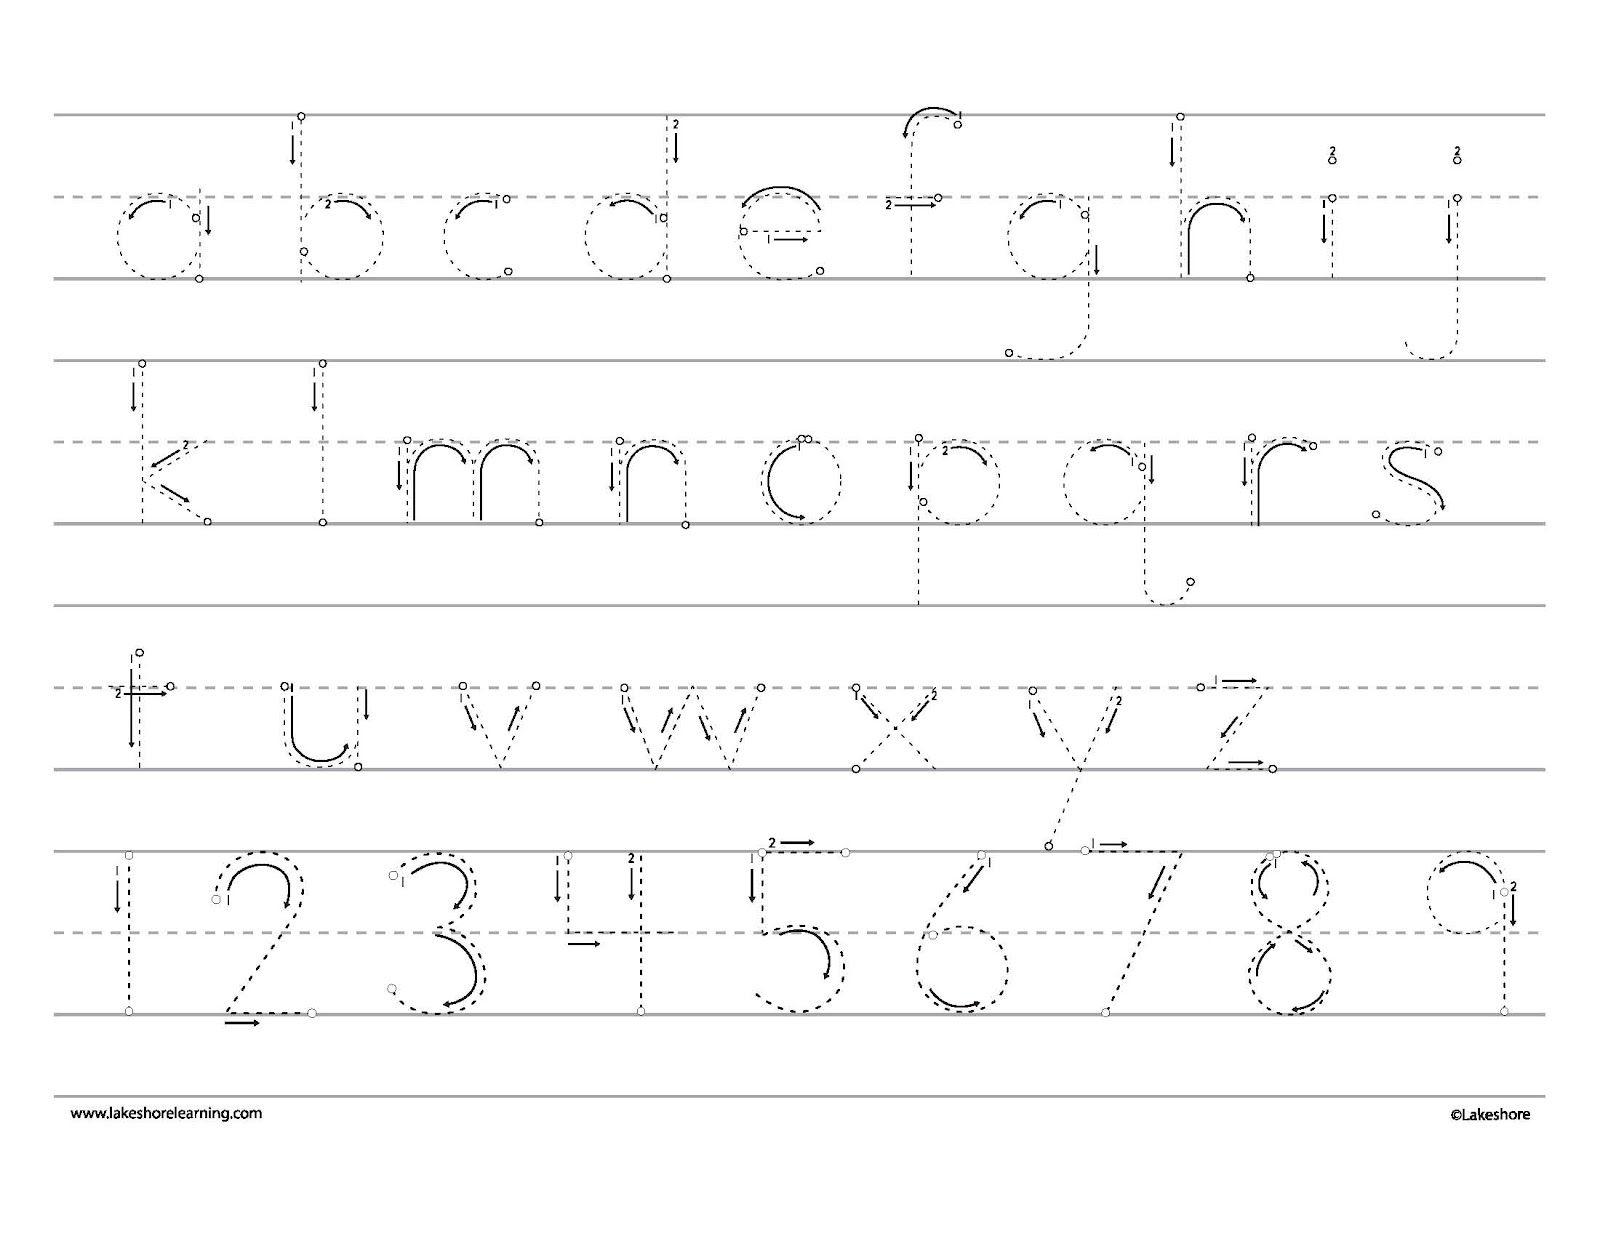 Tracing Cards Alphabet